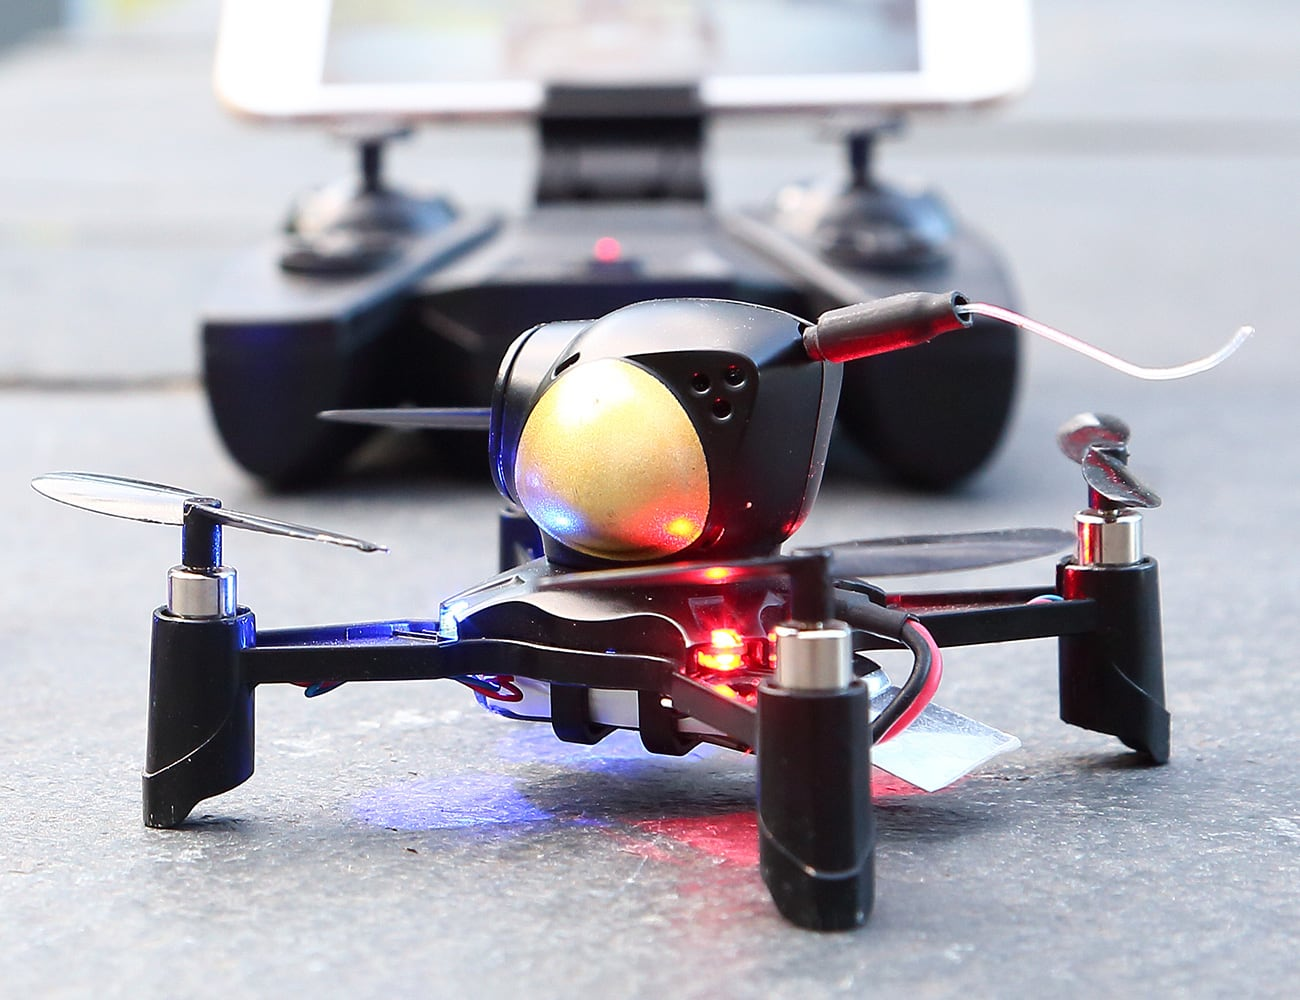 Rockee DIY Infrared Athletic Battle Drone